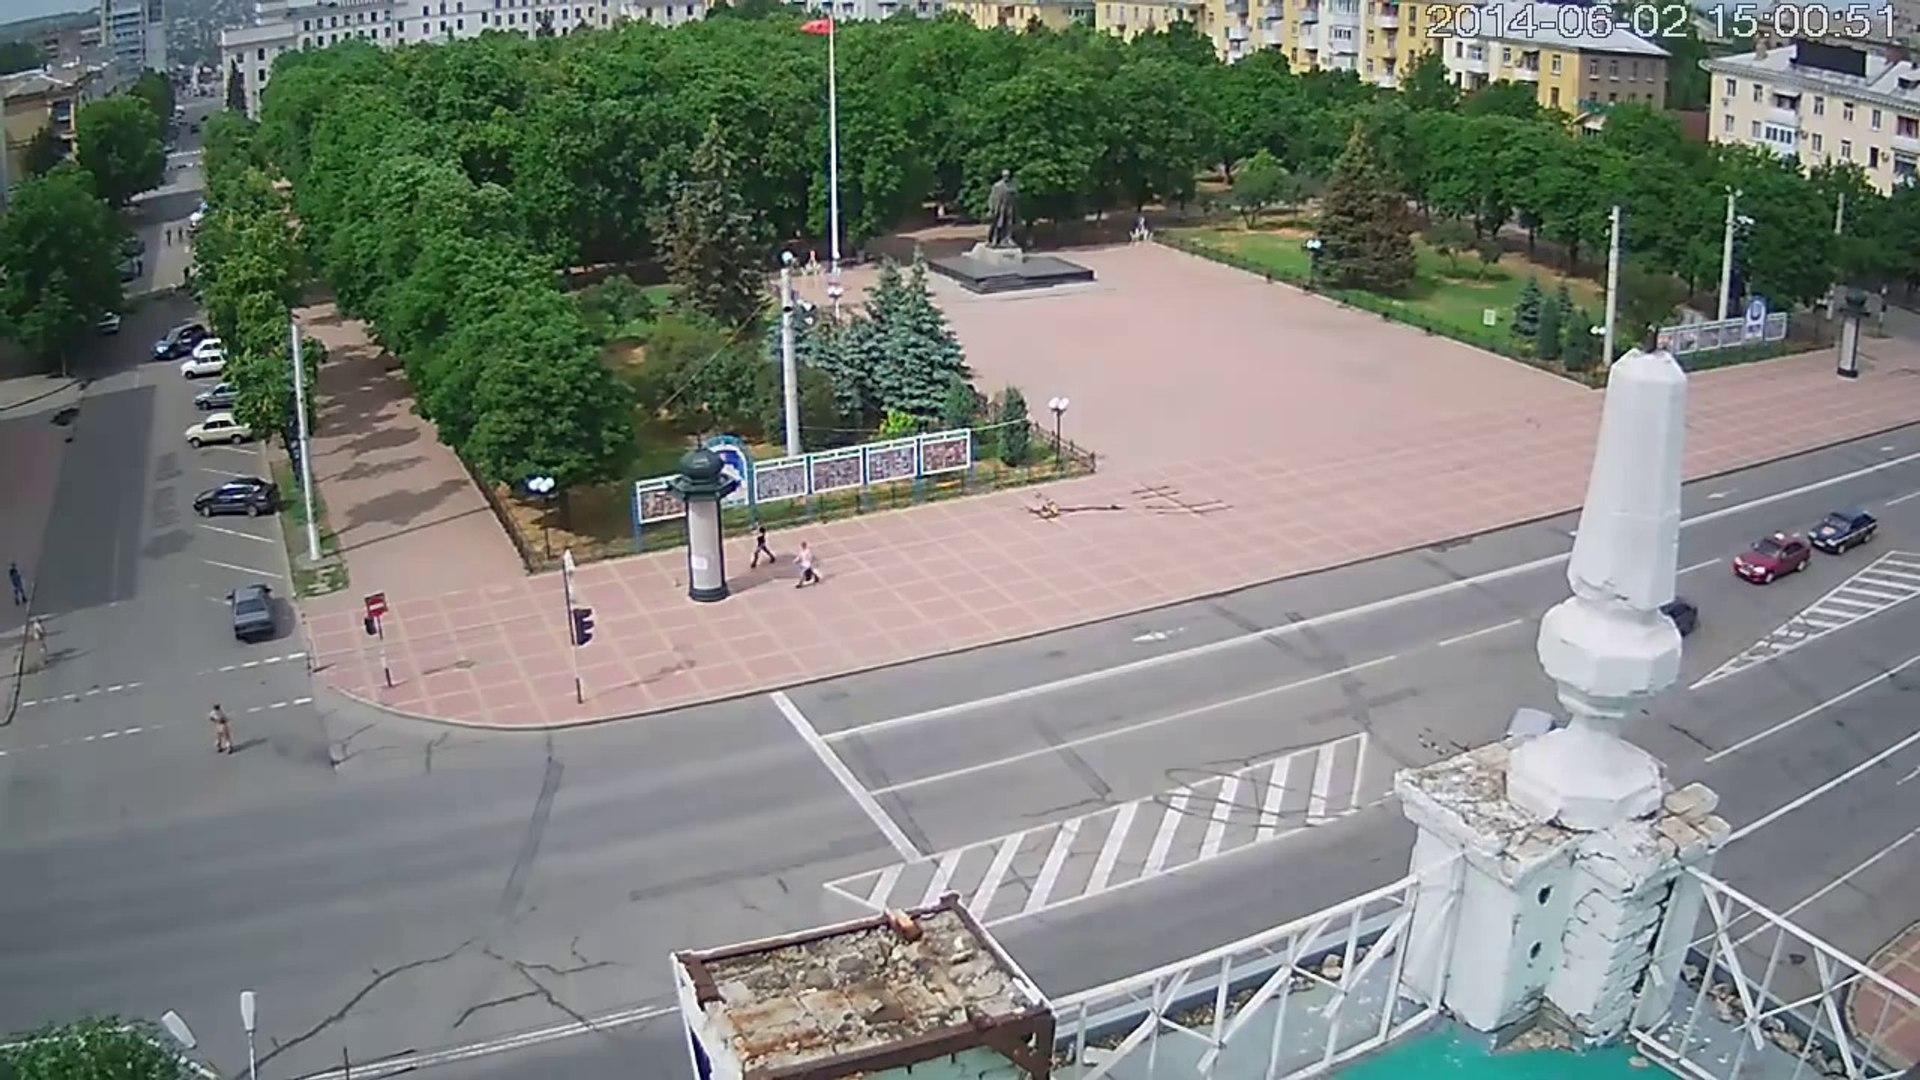 Луганск 02.06.14 Полное видео обстрела ОГА украинскими фашистами-Bombed city administration